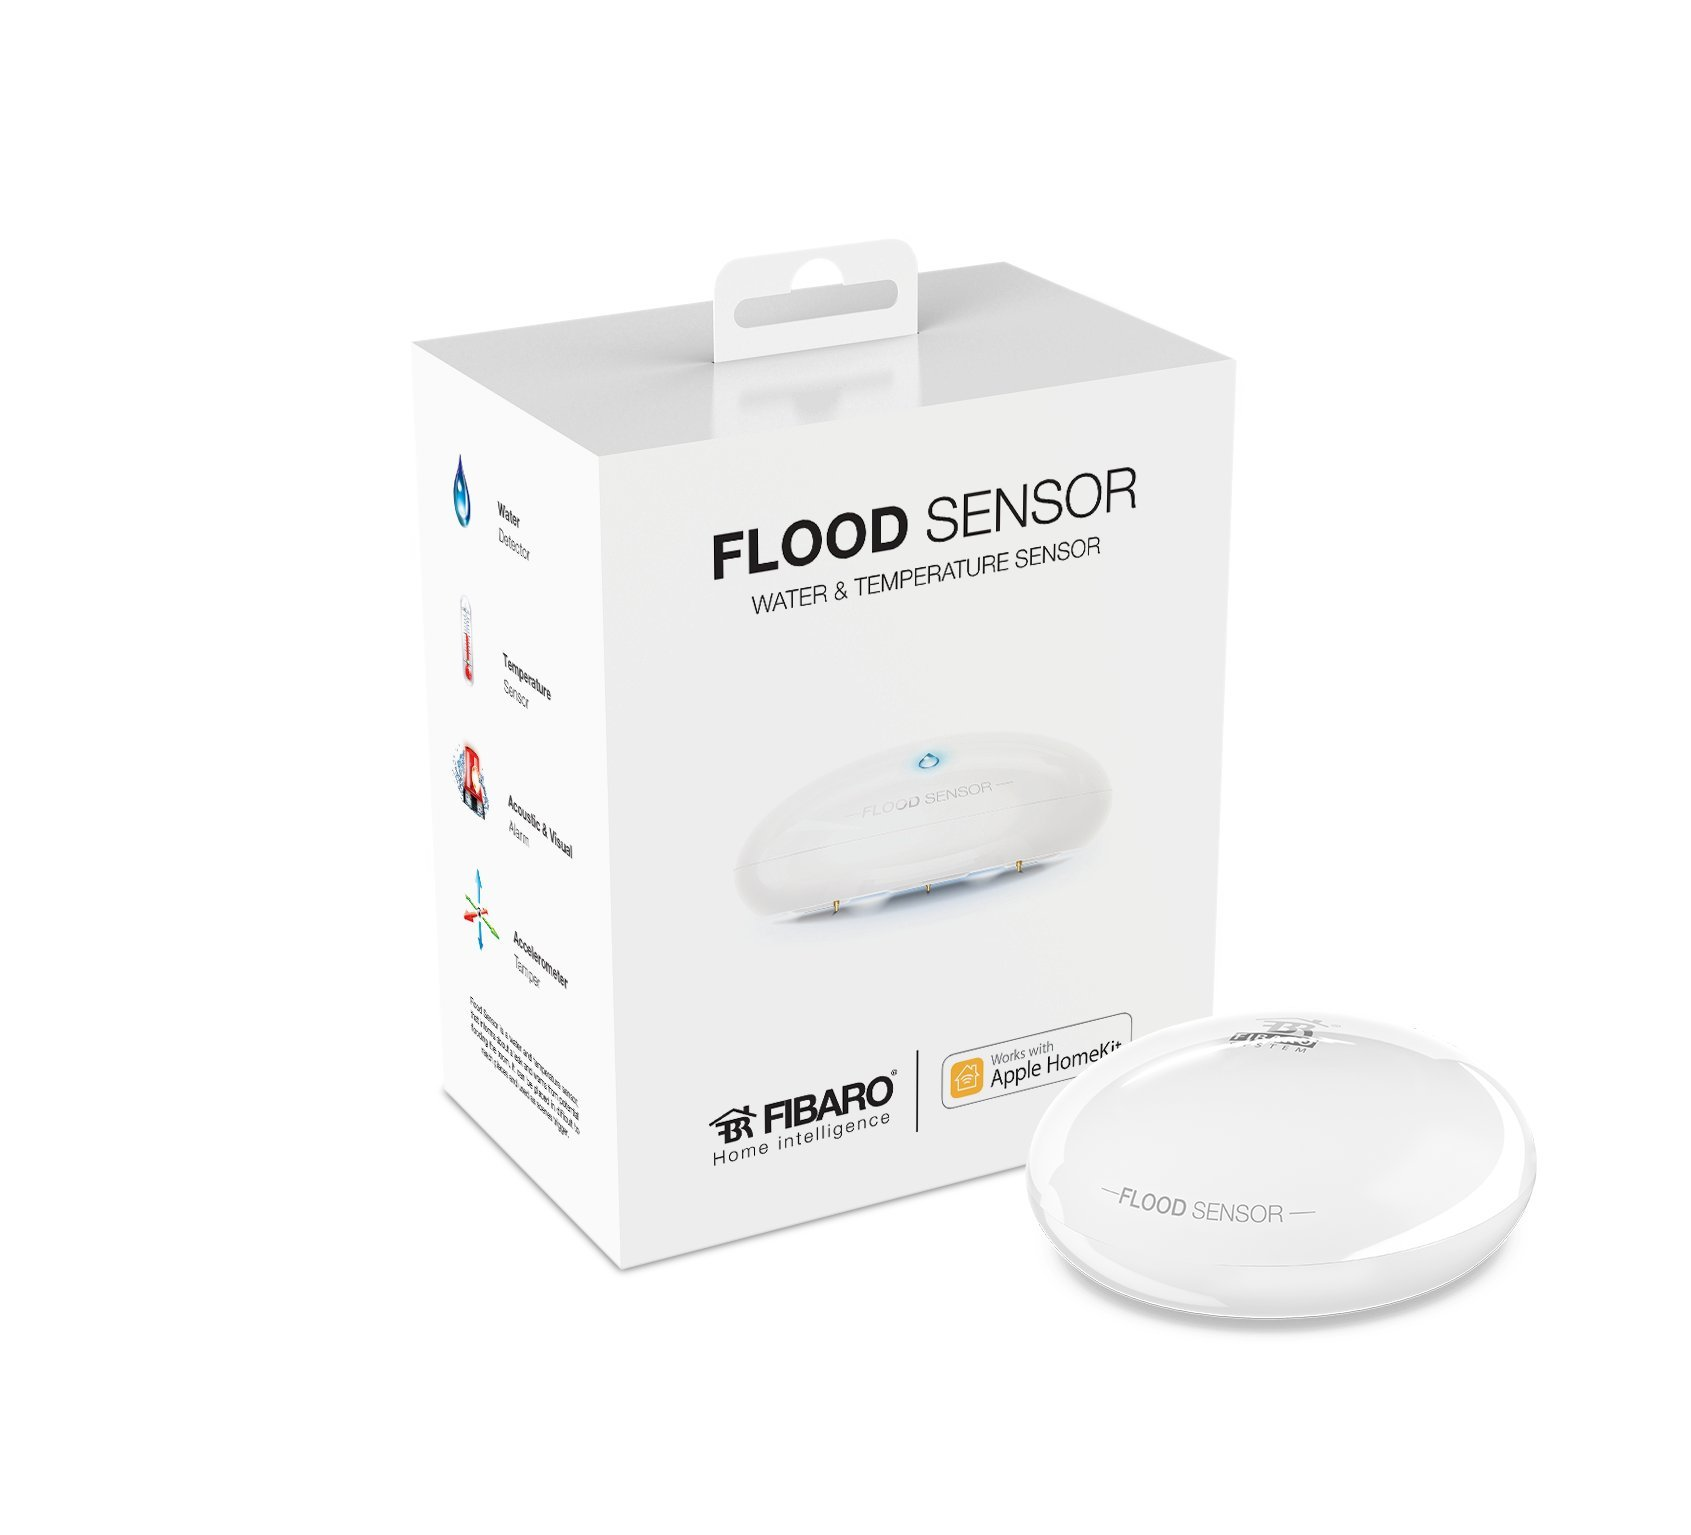 FIBARO HomeKit  Flood Sensor, Water & Temperature Sensor for HomeKit only by Fibaro